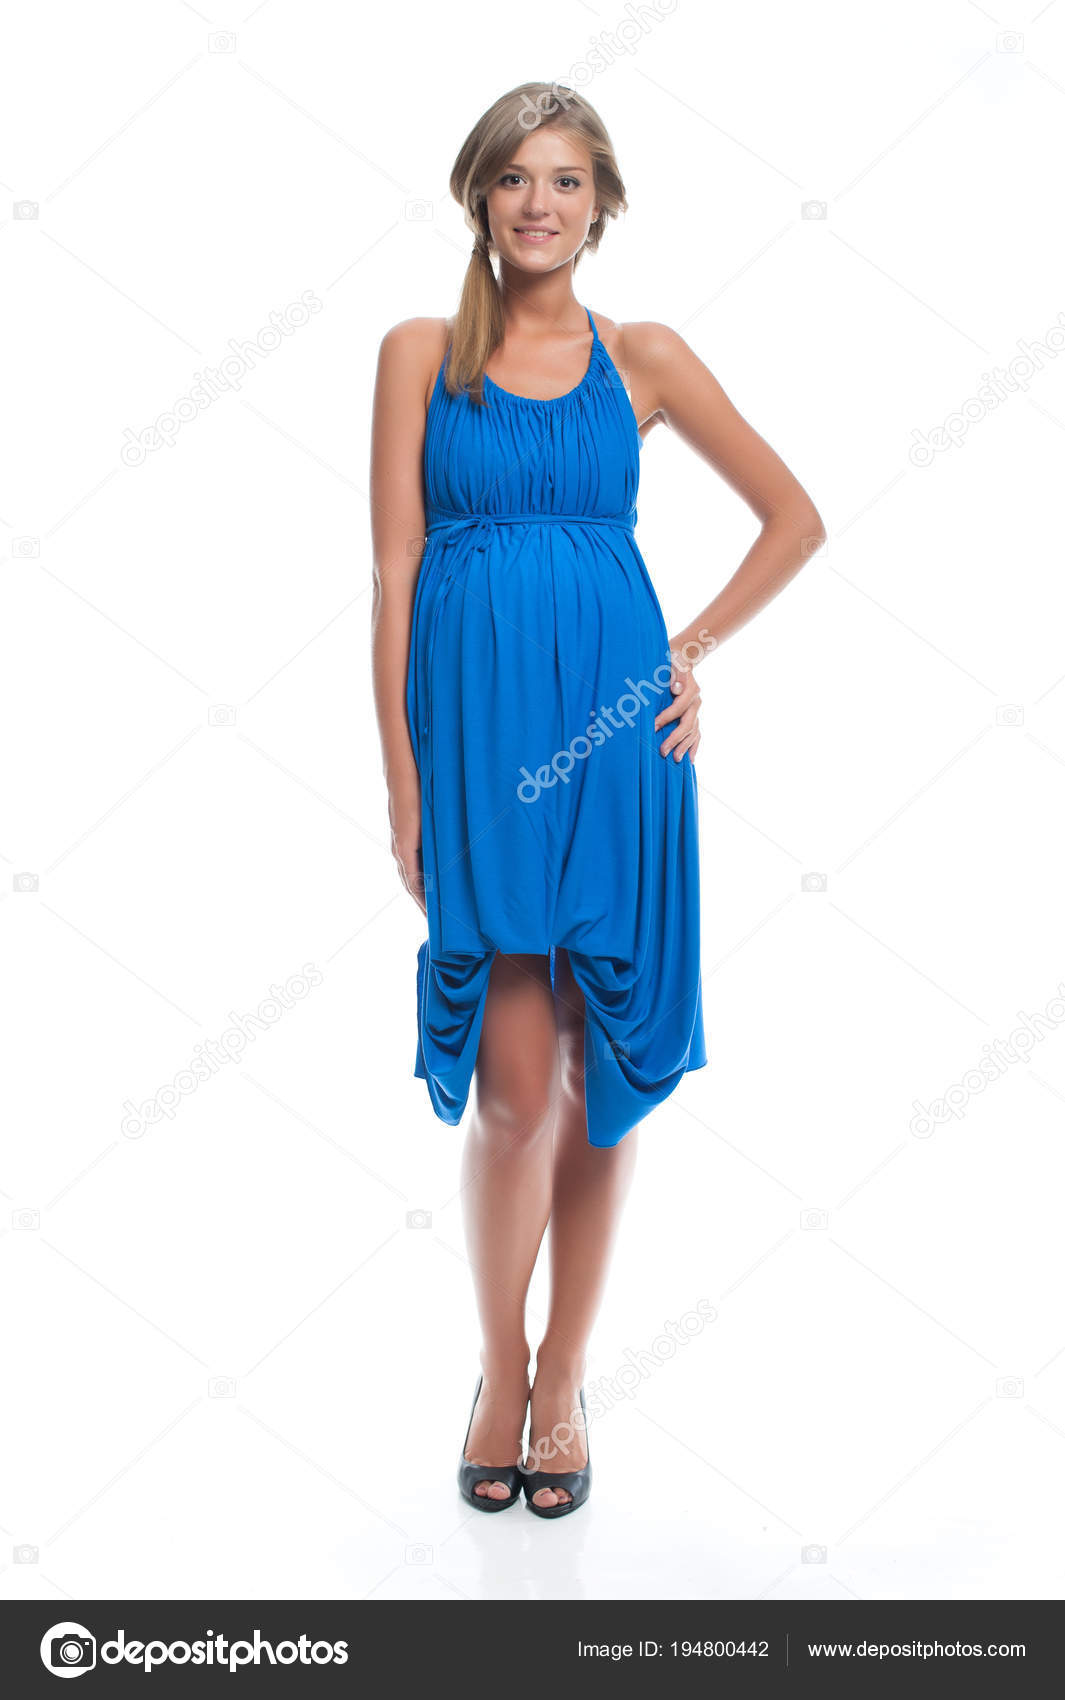 1b264e1d9 Modelo Embarazada Vestido Azul Para Embarazo Ropa Para Embarazadas — Foto  de Stock